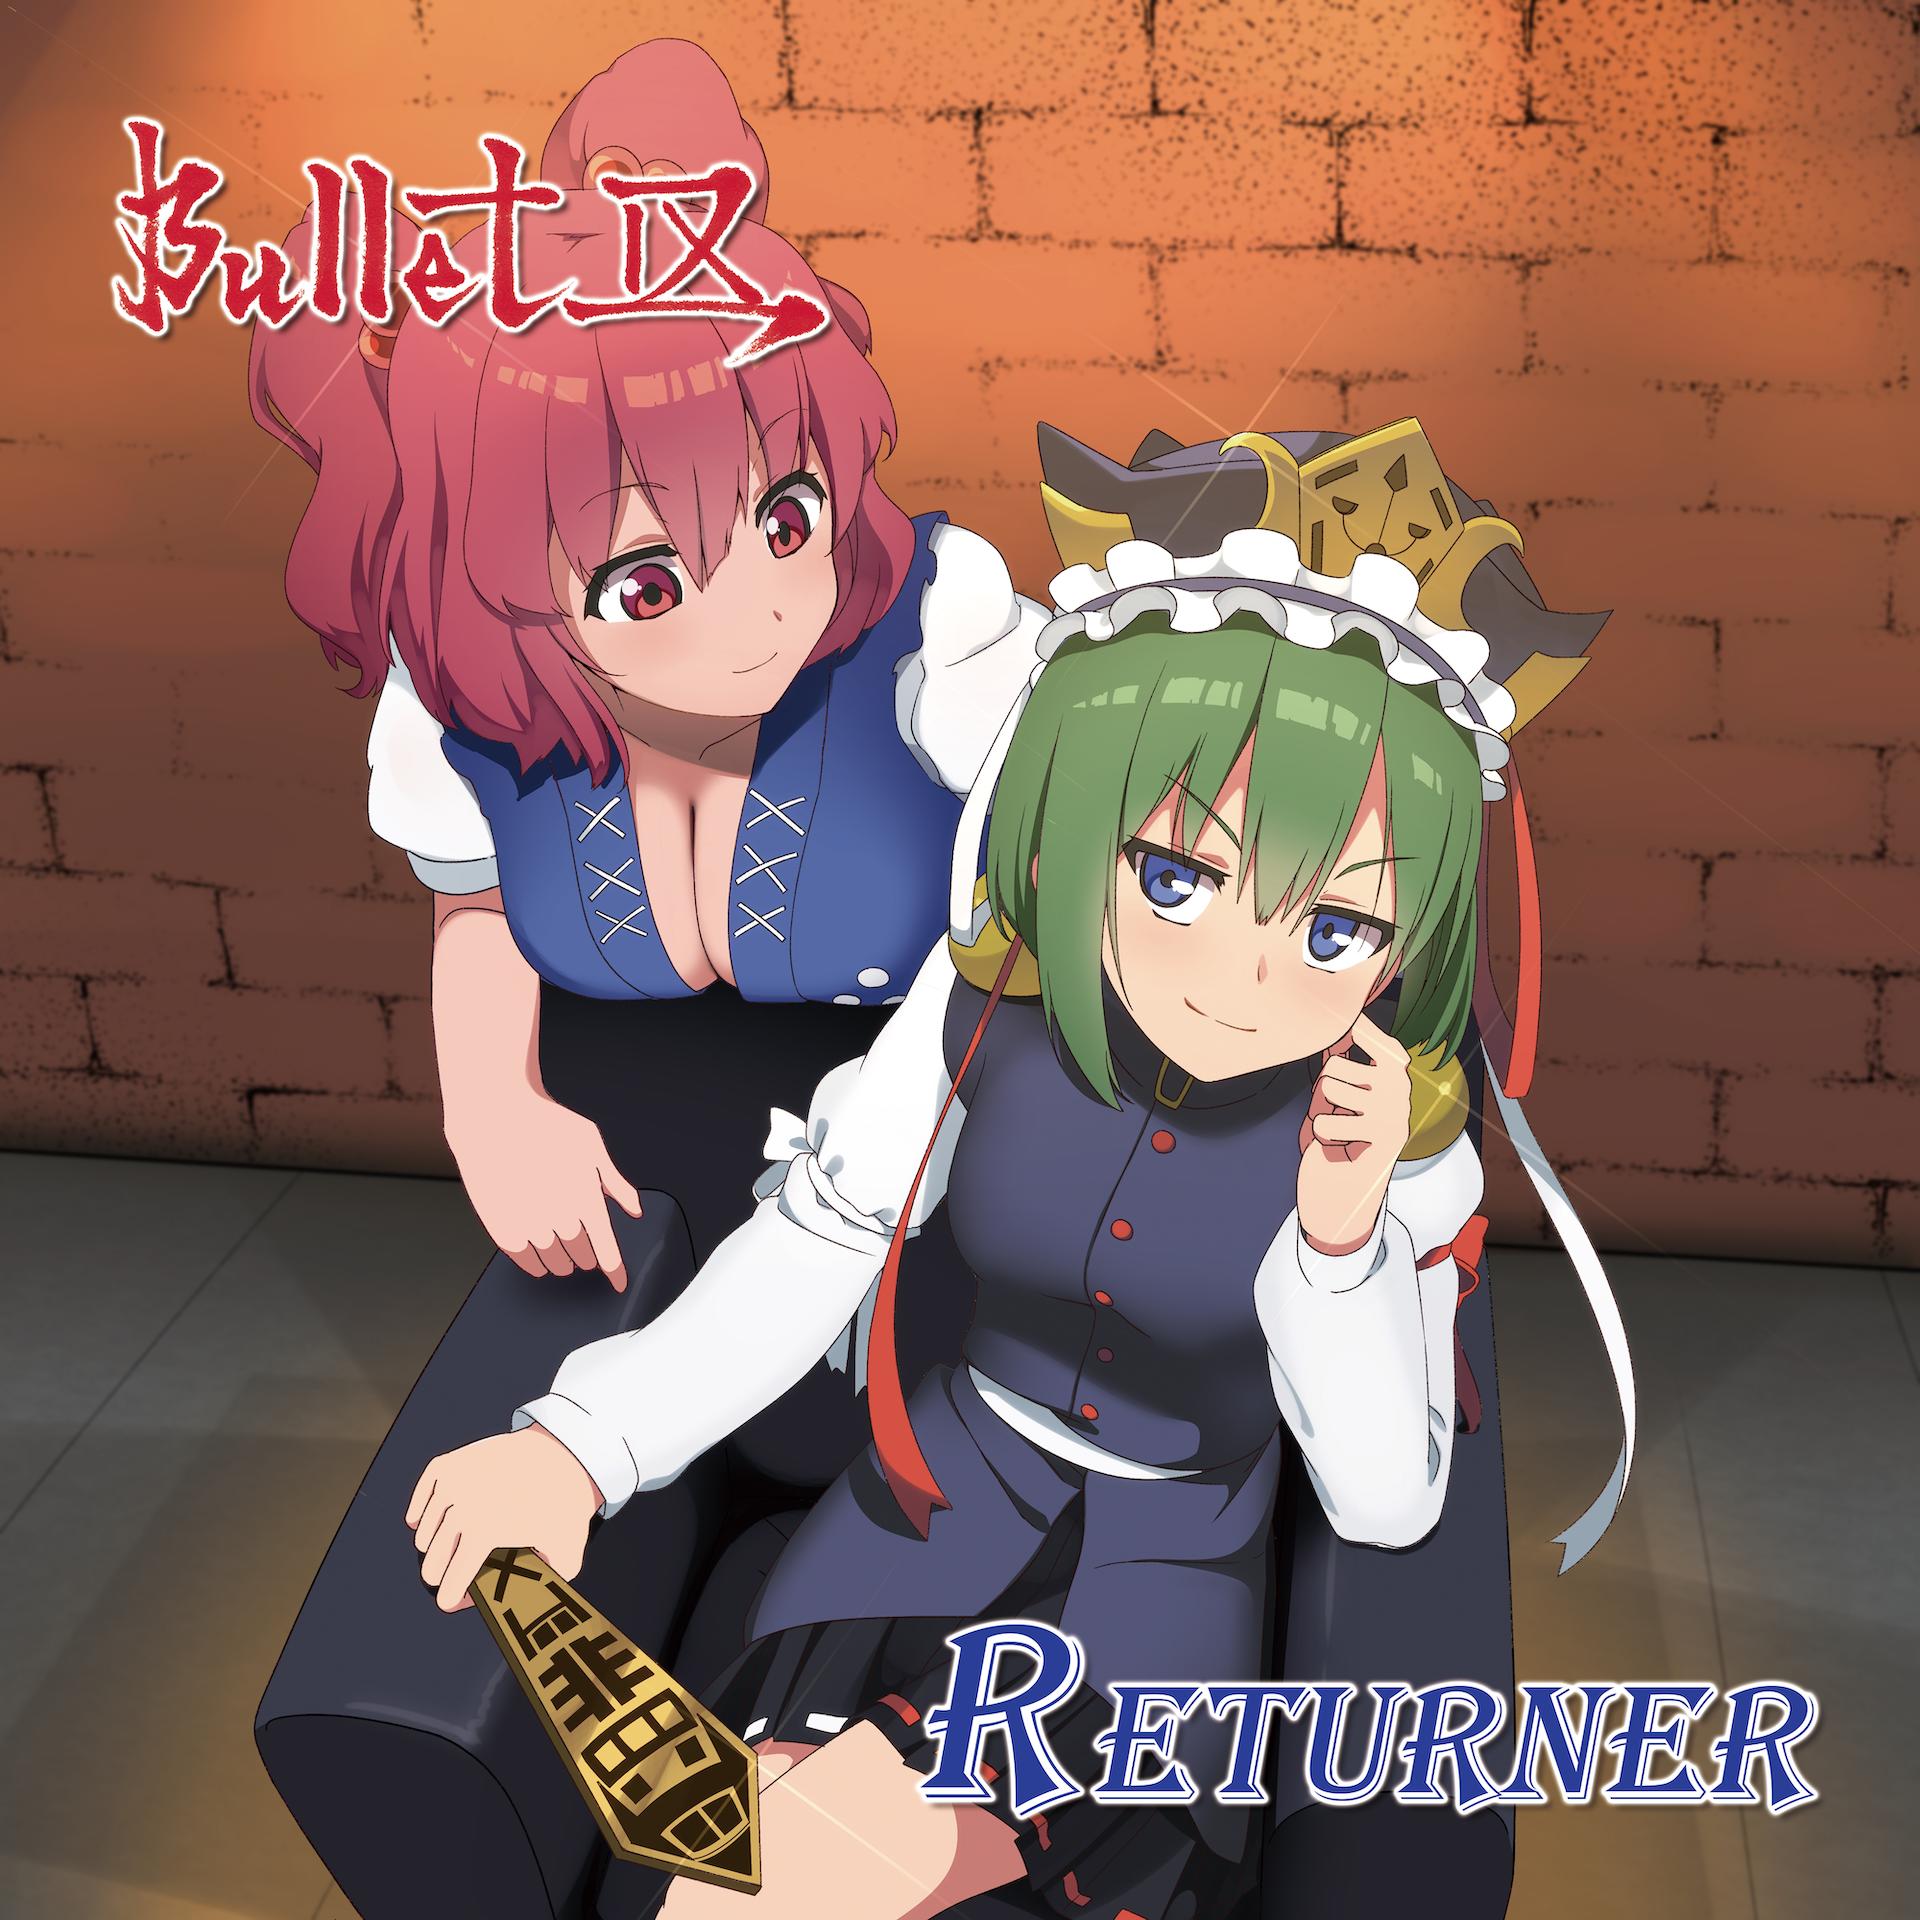 Bullet IX|RETURNER(完成版) ジャケット